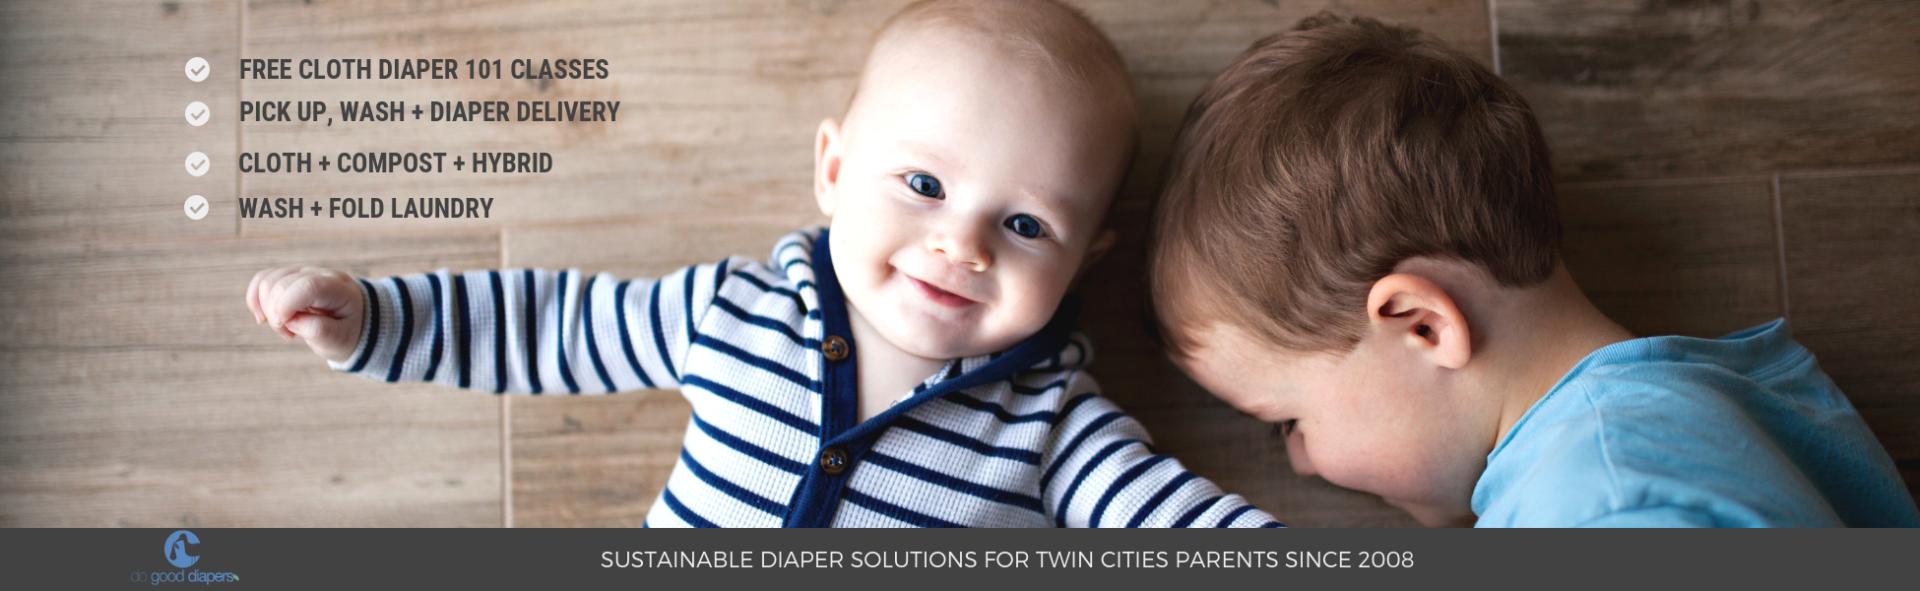 Do Good Diaper Cloth Diaper Service - Minneapolis, MN